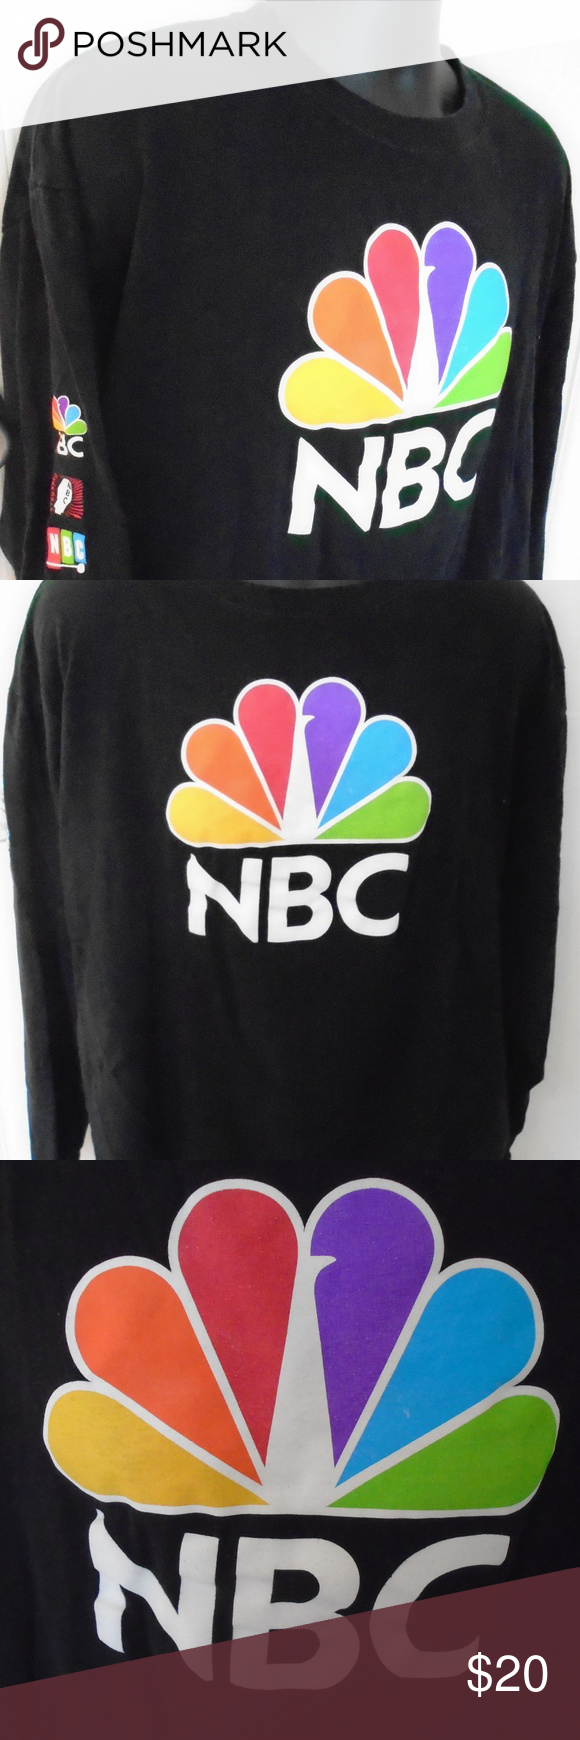 NBC Network TShirt Television Peacock Logo XL Peacock